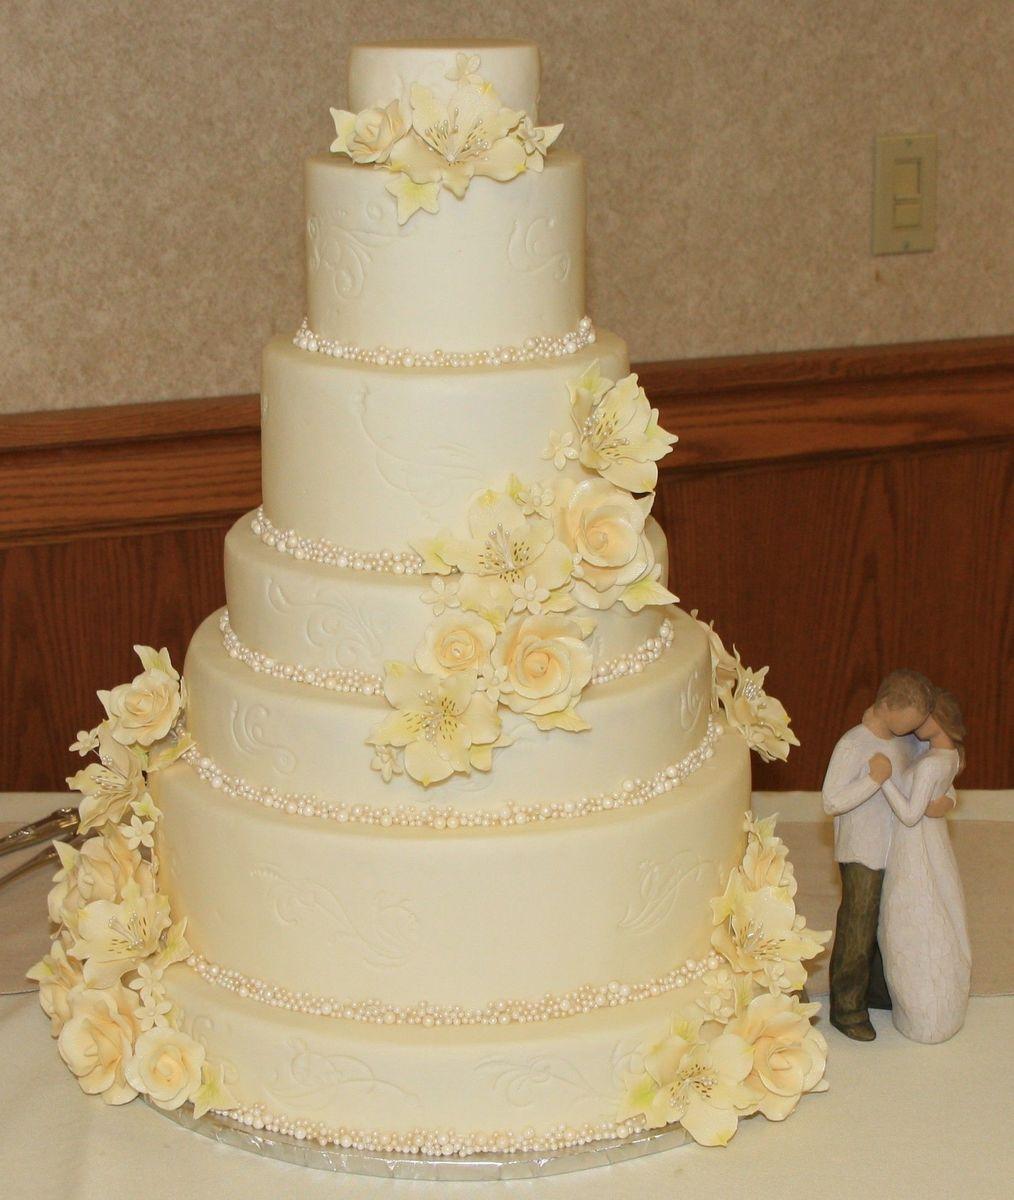 Kathy\'s Kakes, LLC - Wedding Cake - Independence, IA - WeddingWire